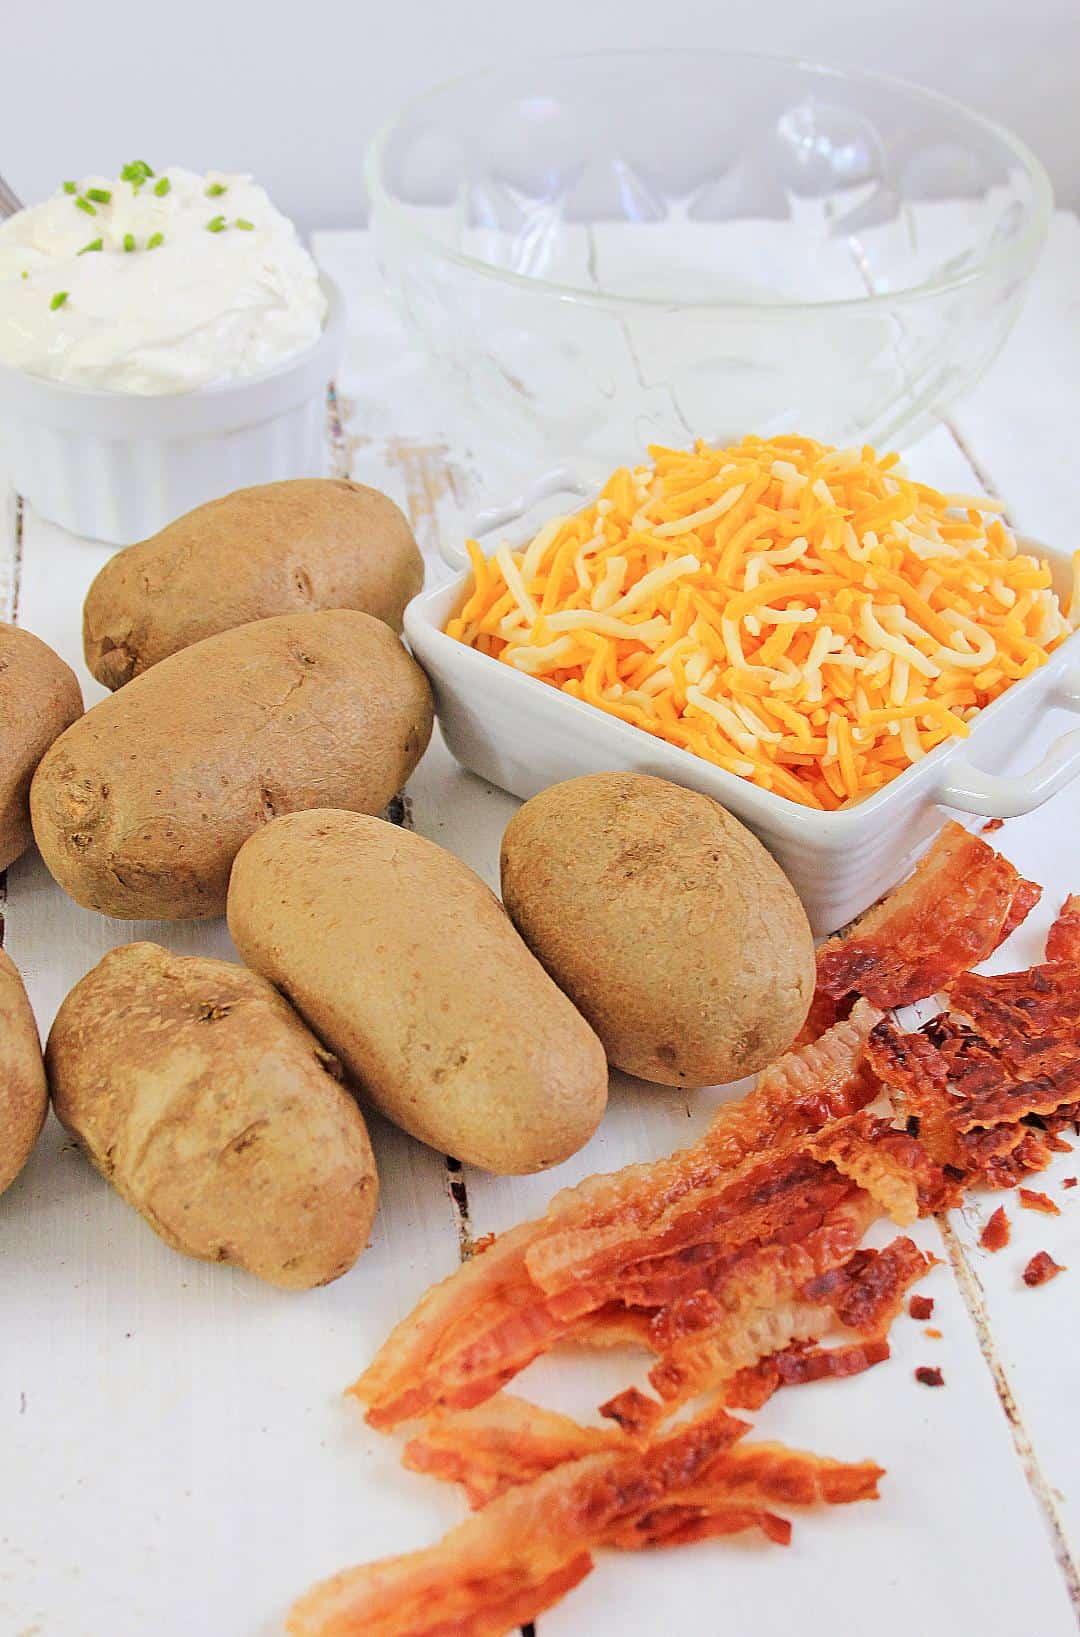 Loaded Baked Potato Salad Recipe Ingredients